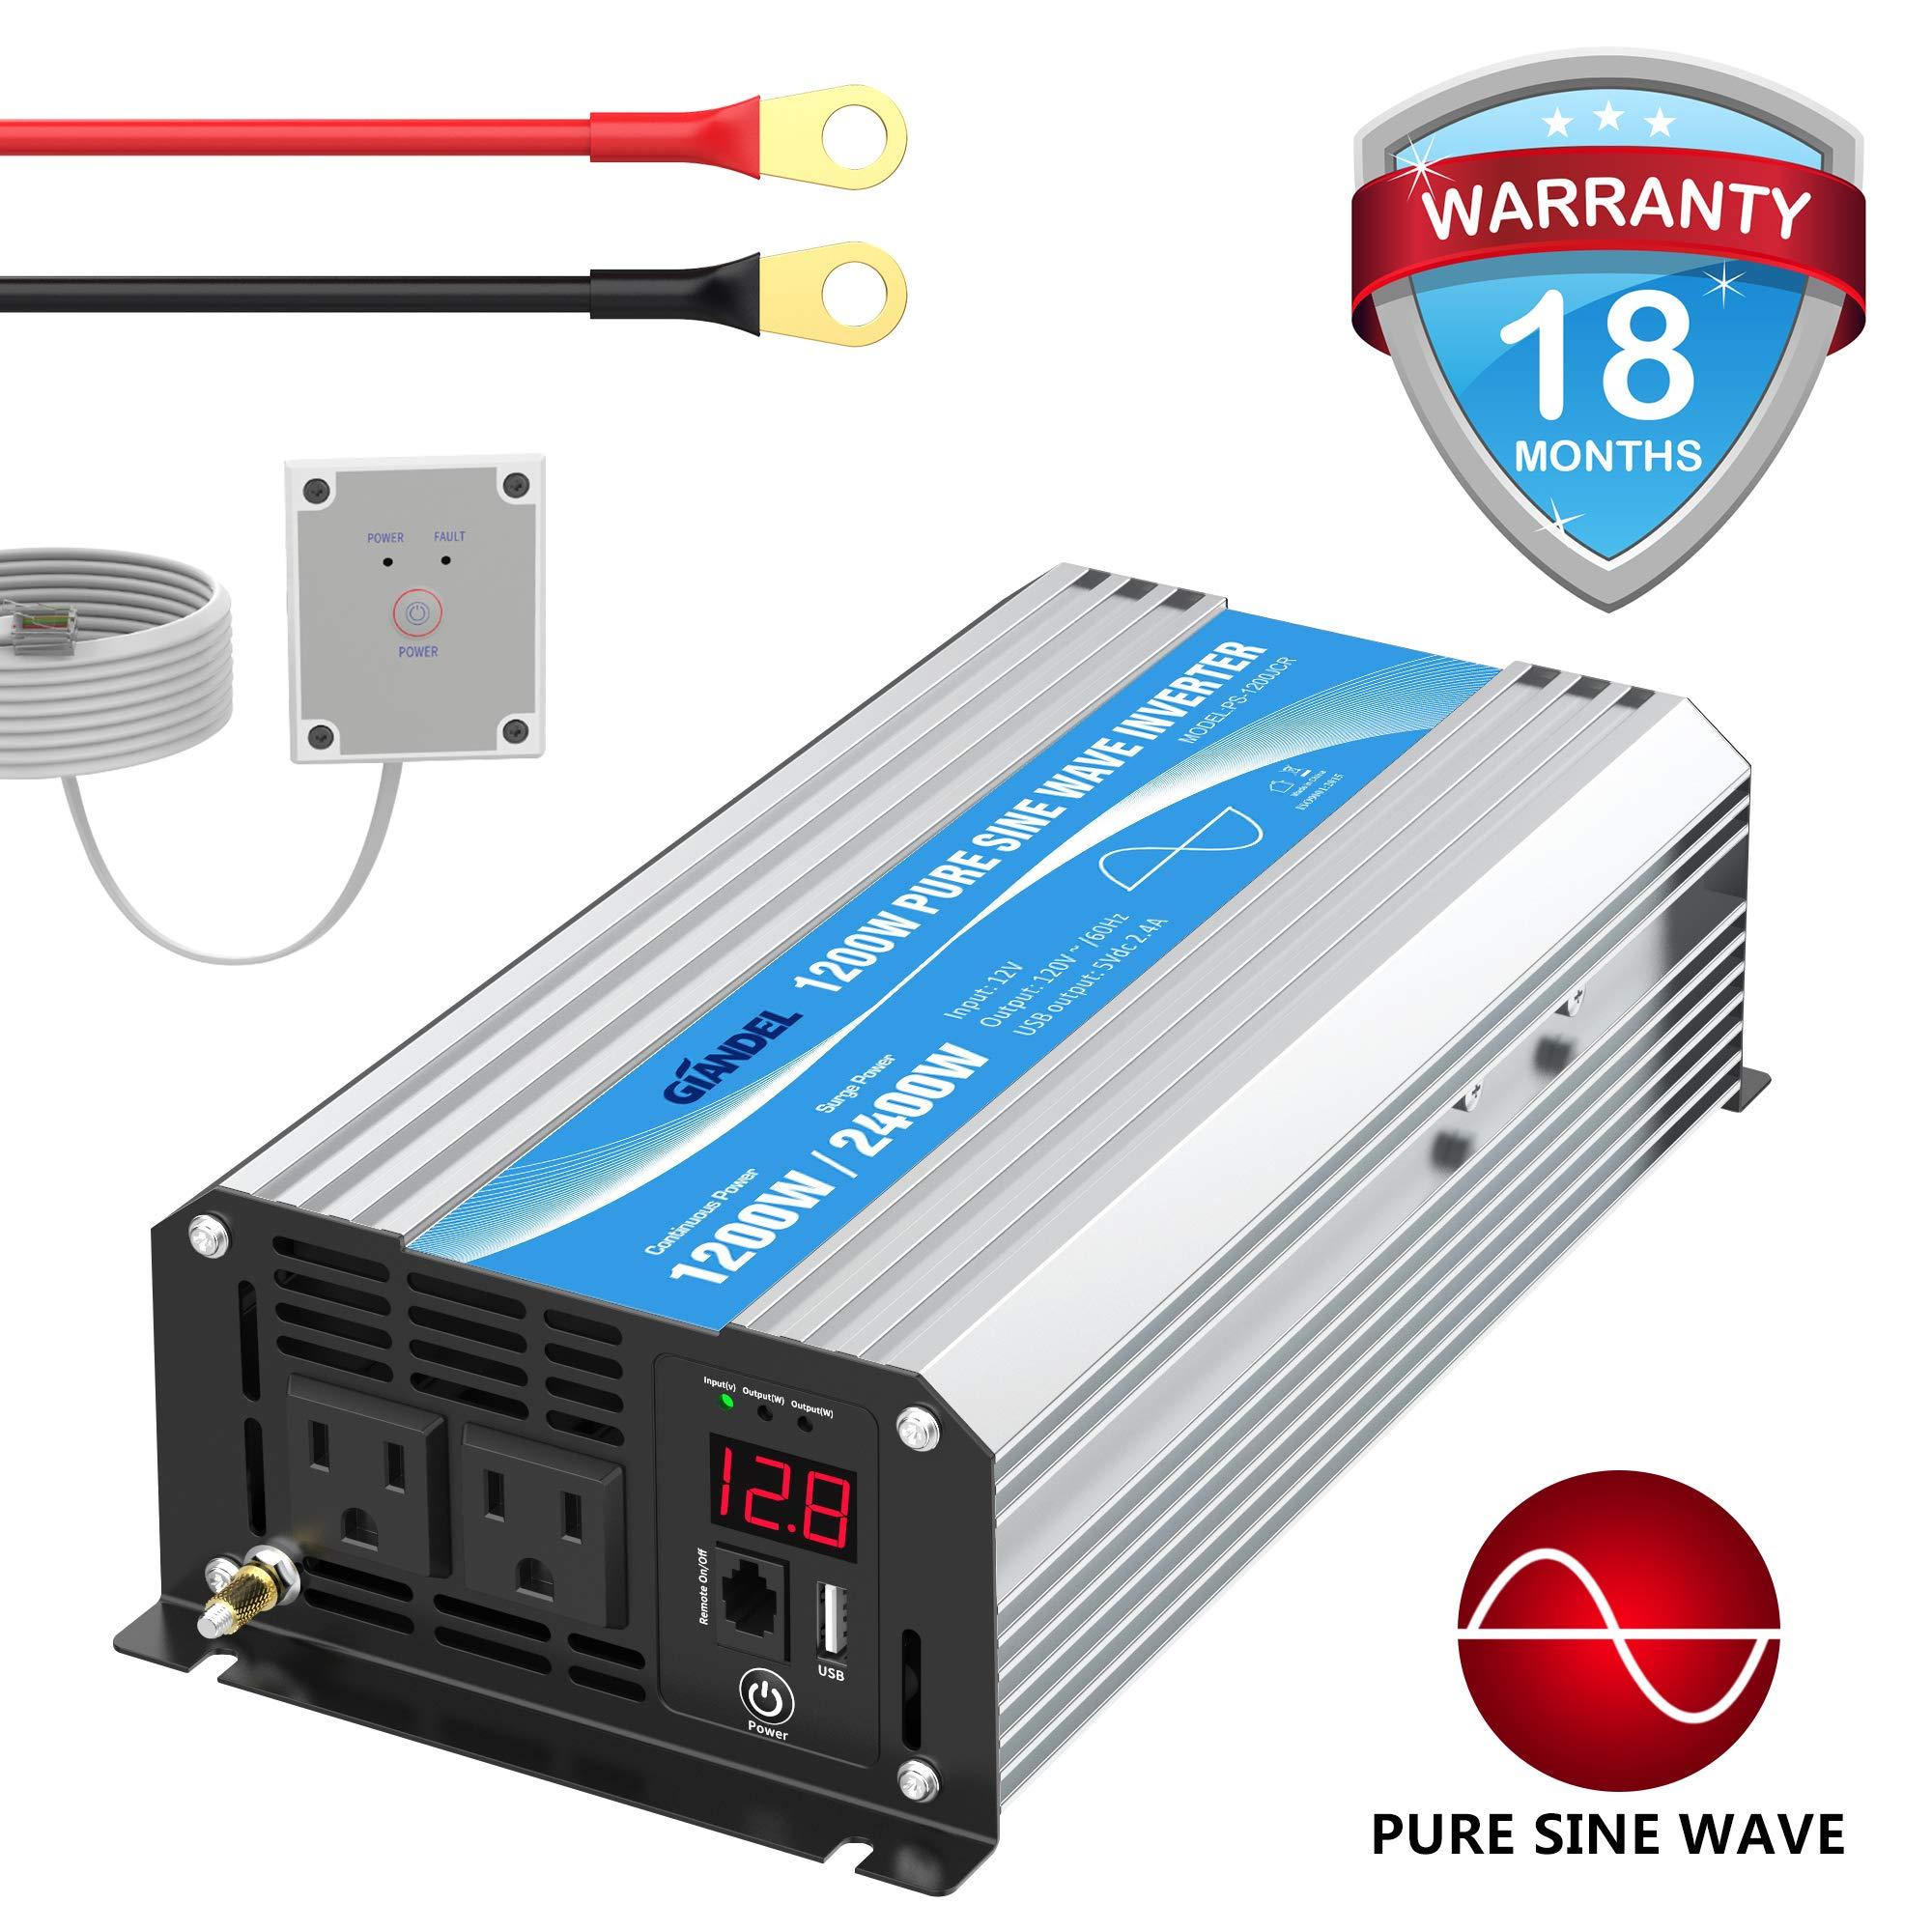 Inverter 1200Watt Control Outlets Emergency